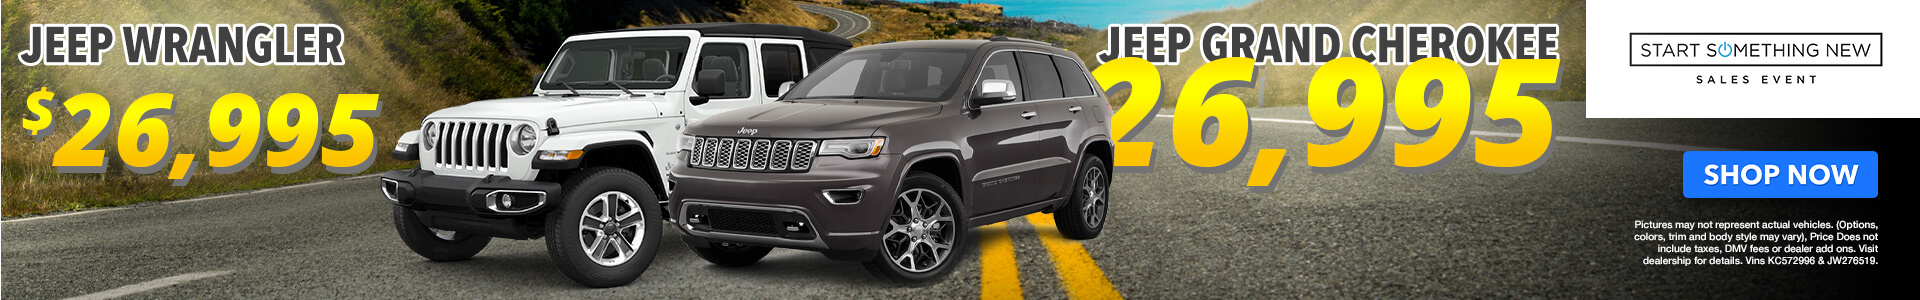 Jeep Cherokee-Wrangler